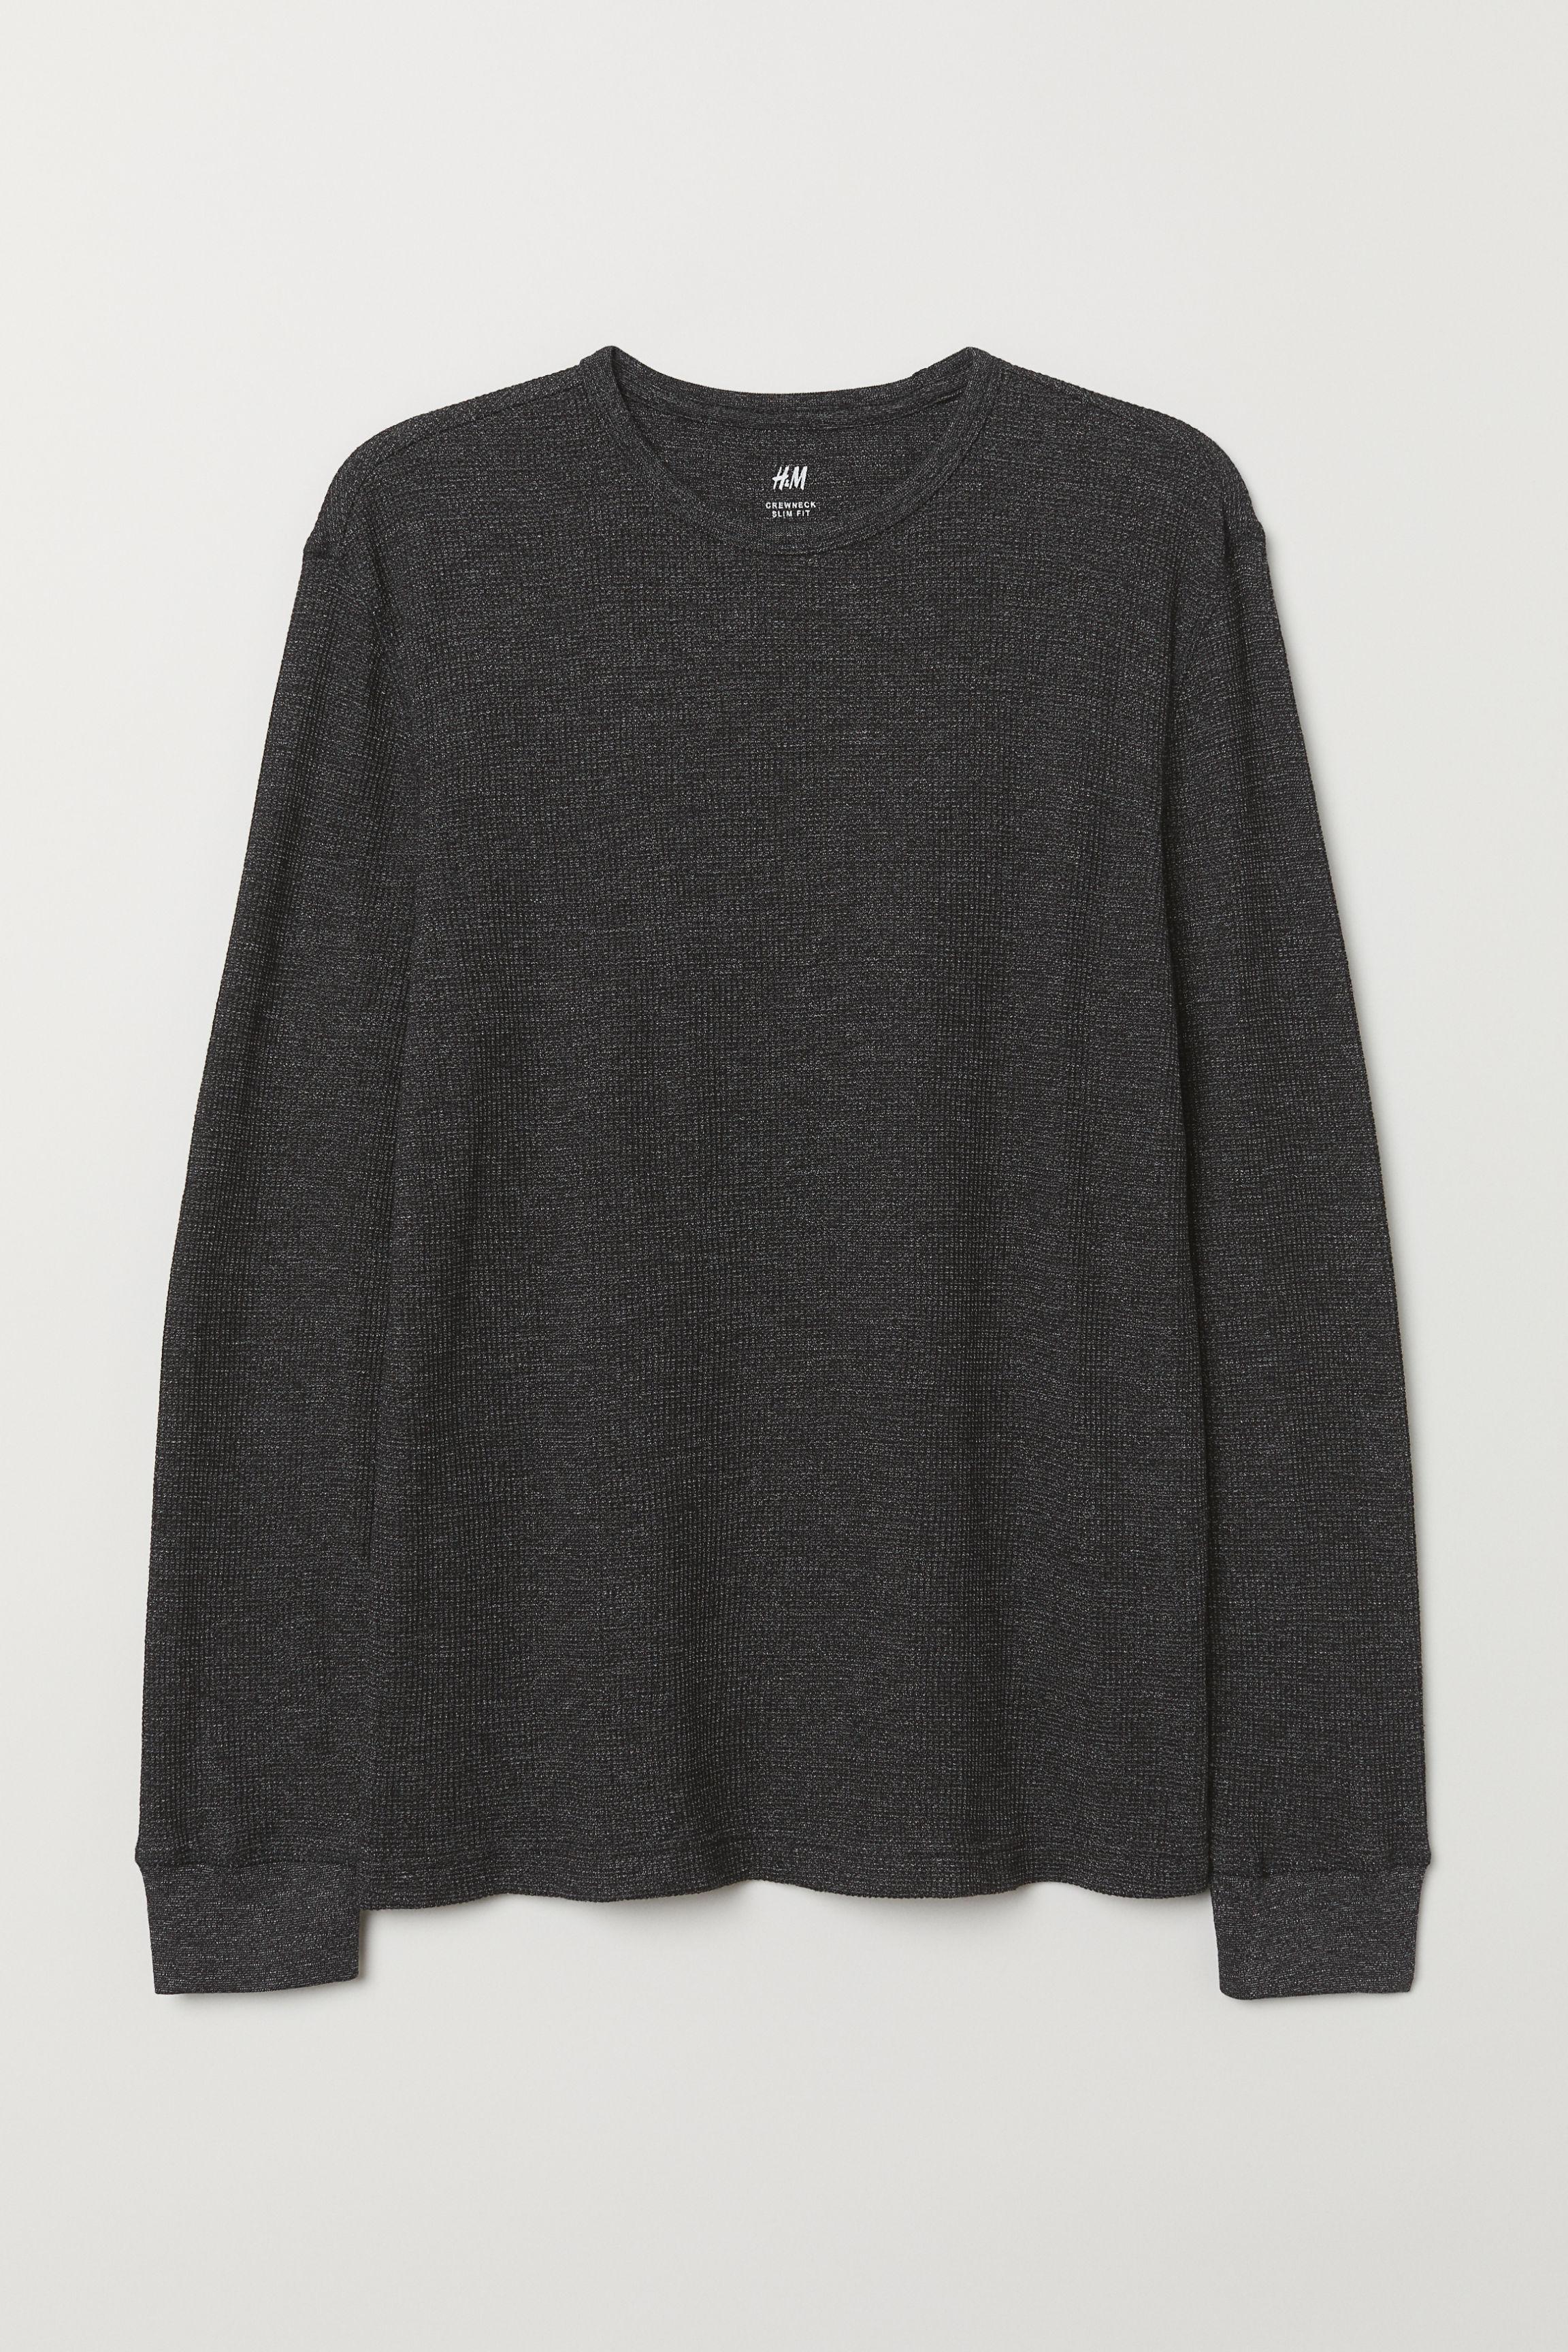 H&M Cotton Waffled Shirt in Black Marl (Black) for Men